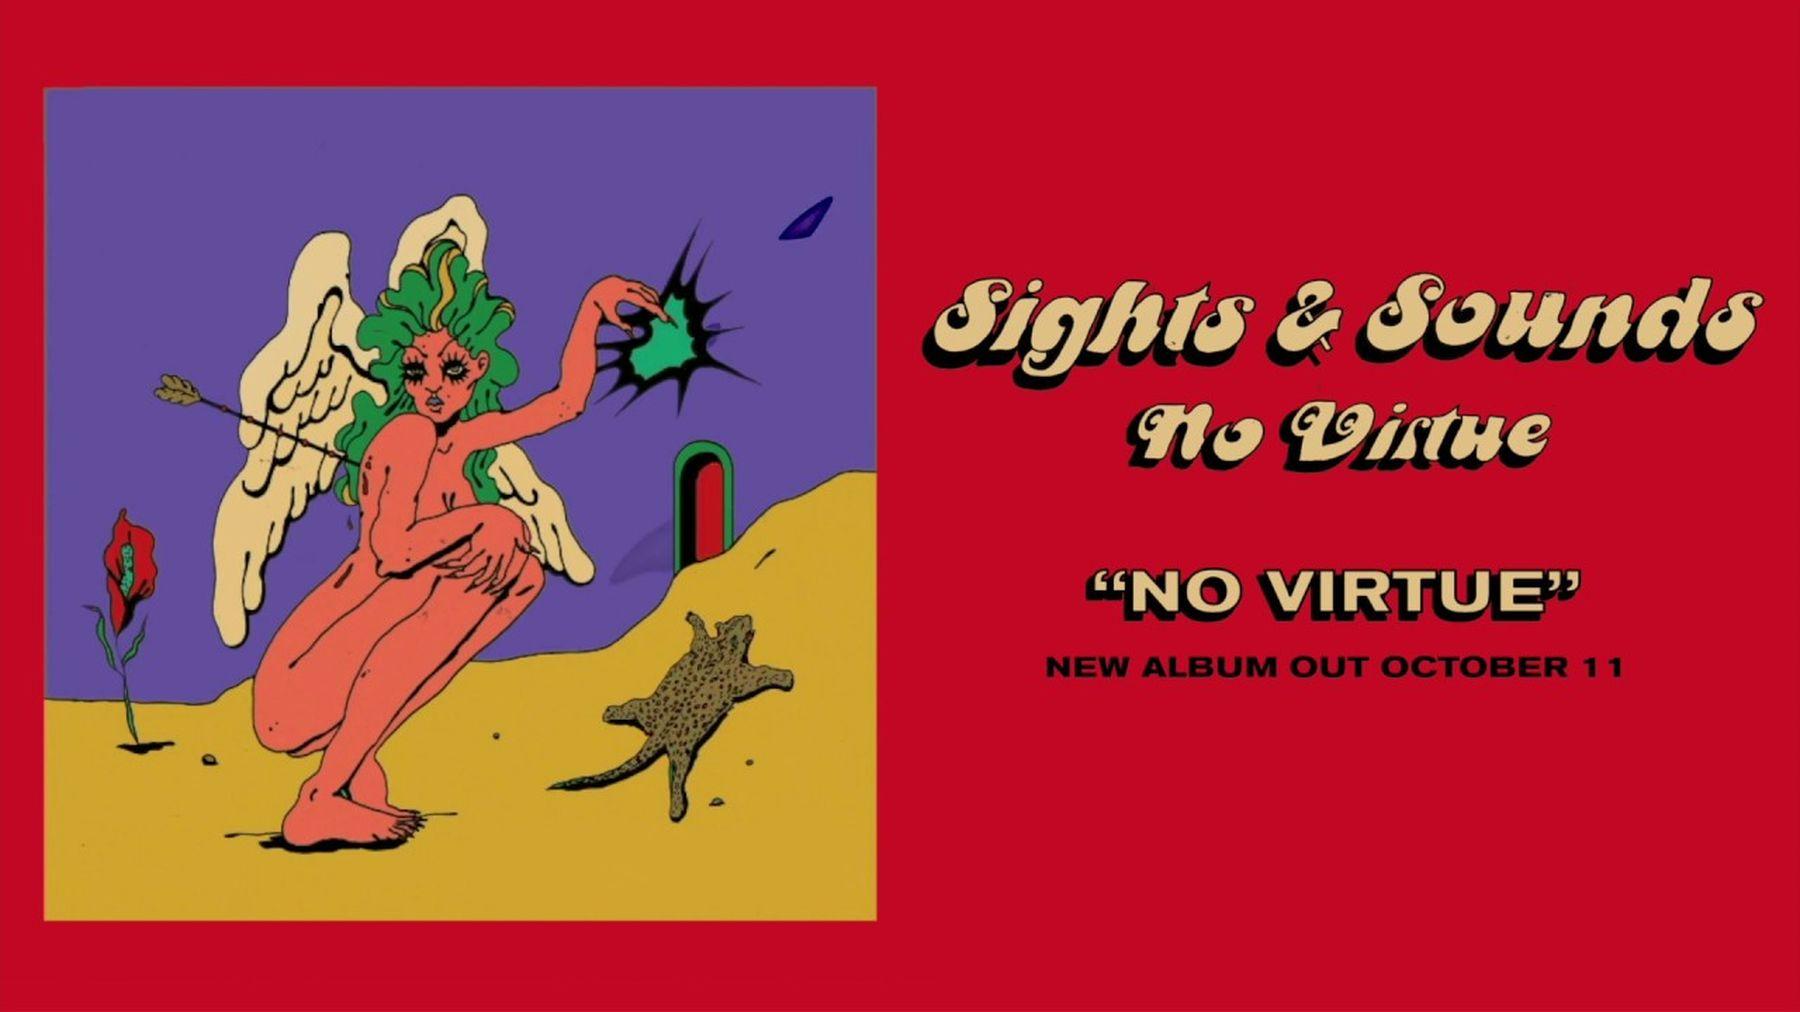 Sights & Sounds - No Virtue | Musik | Was is hier eigentlich los?